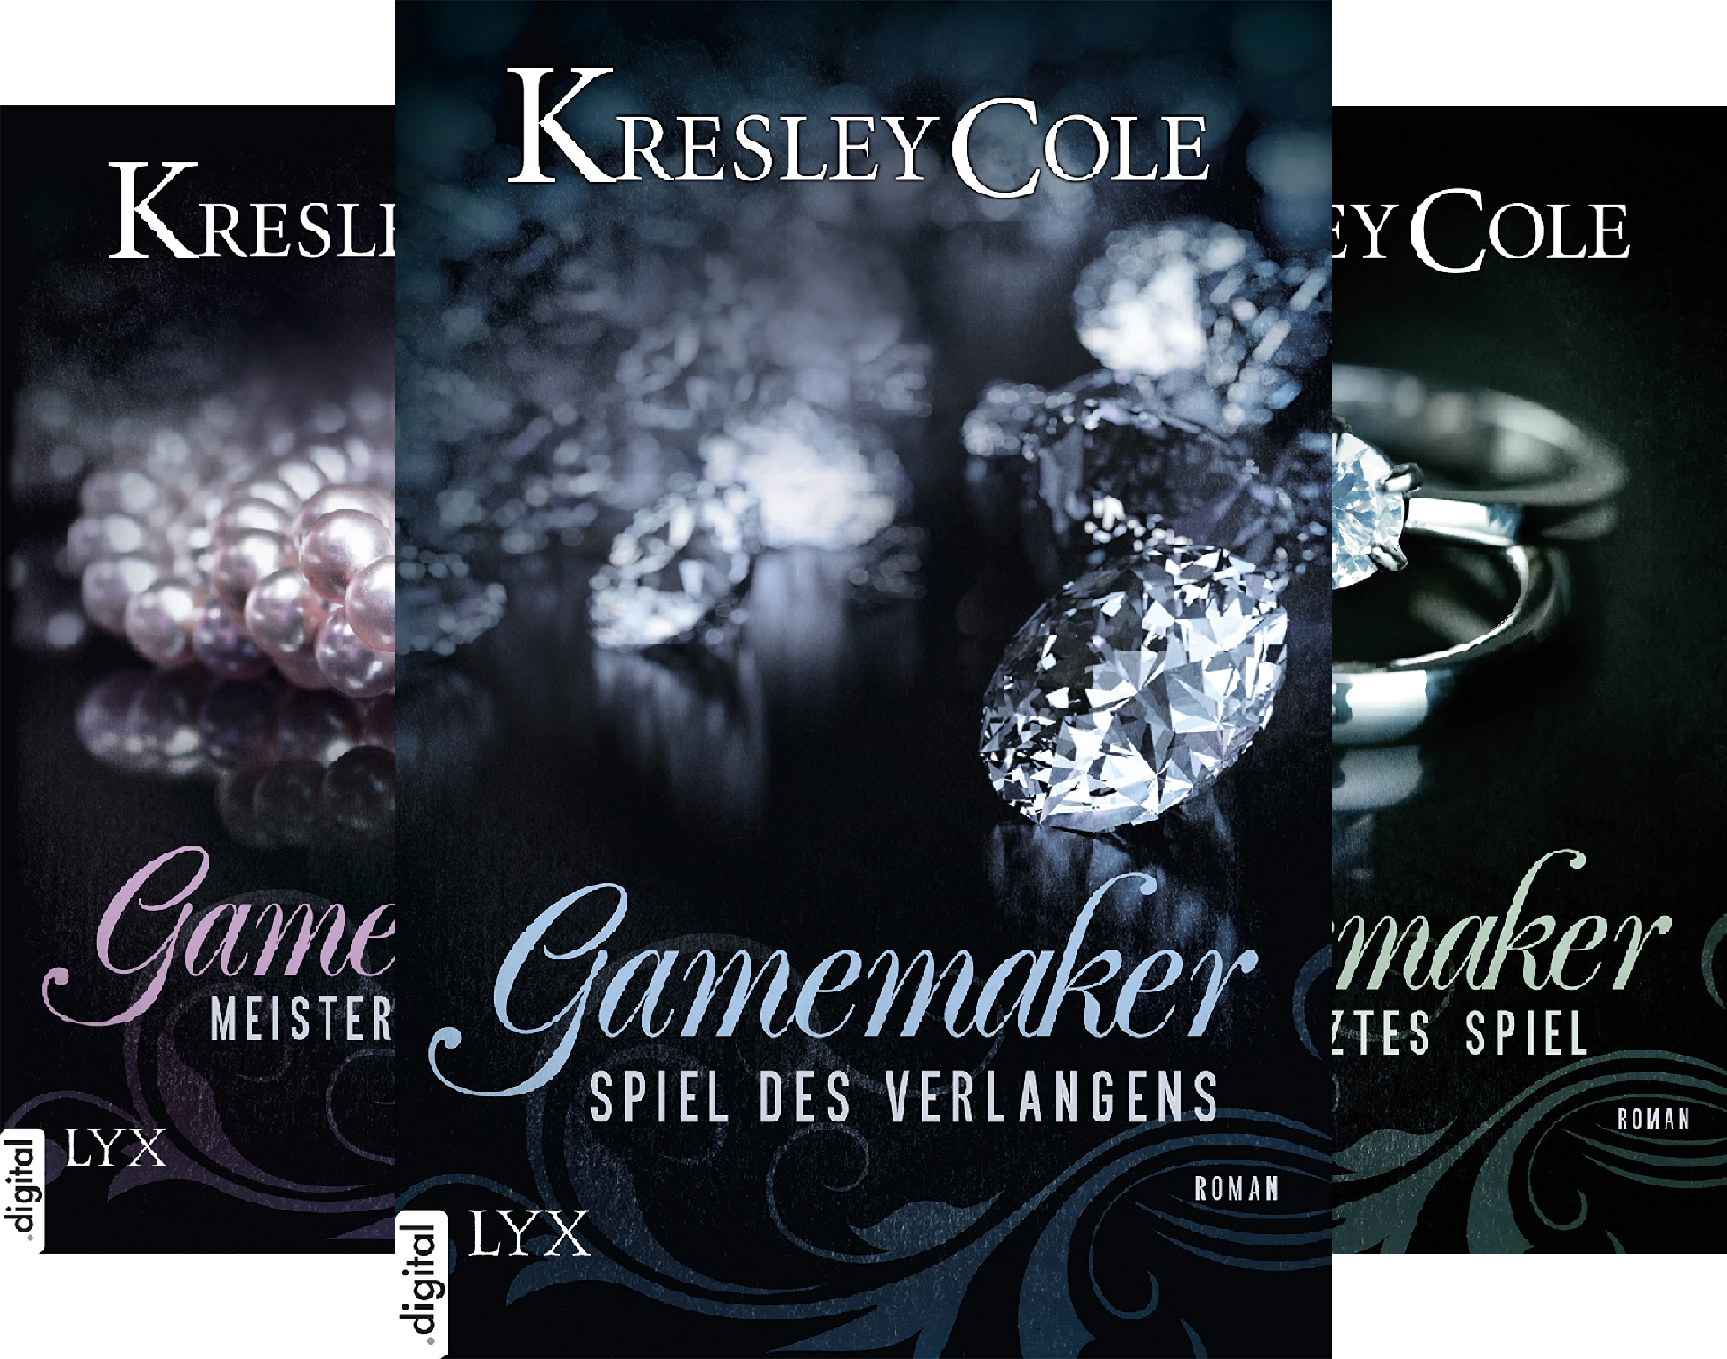 Gamemaker (Reihe in 3 Bänden) (Game Maker)